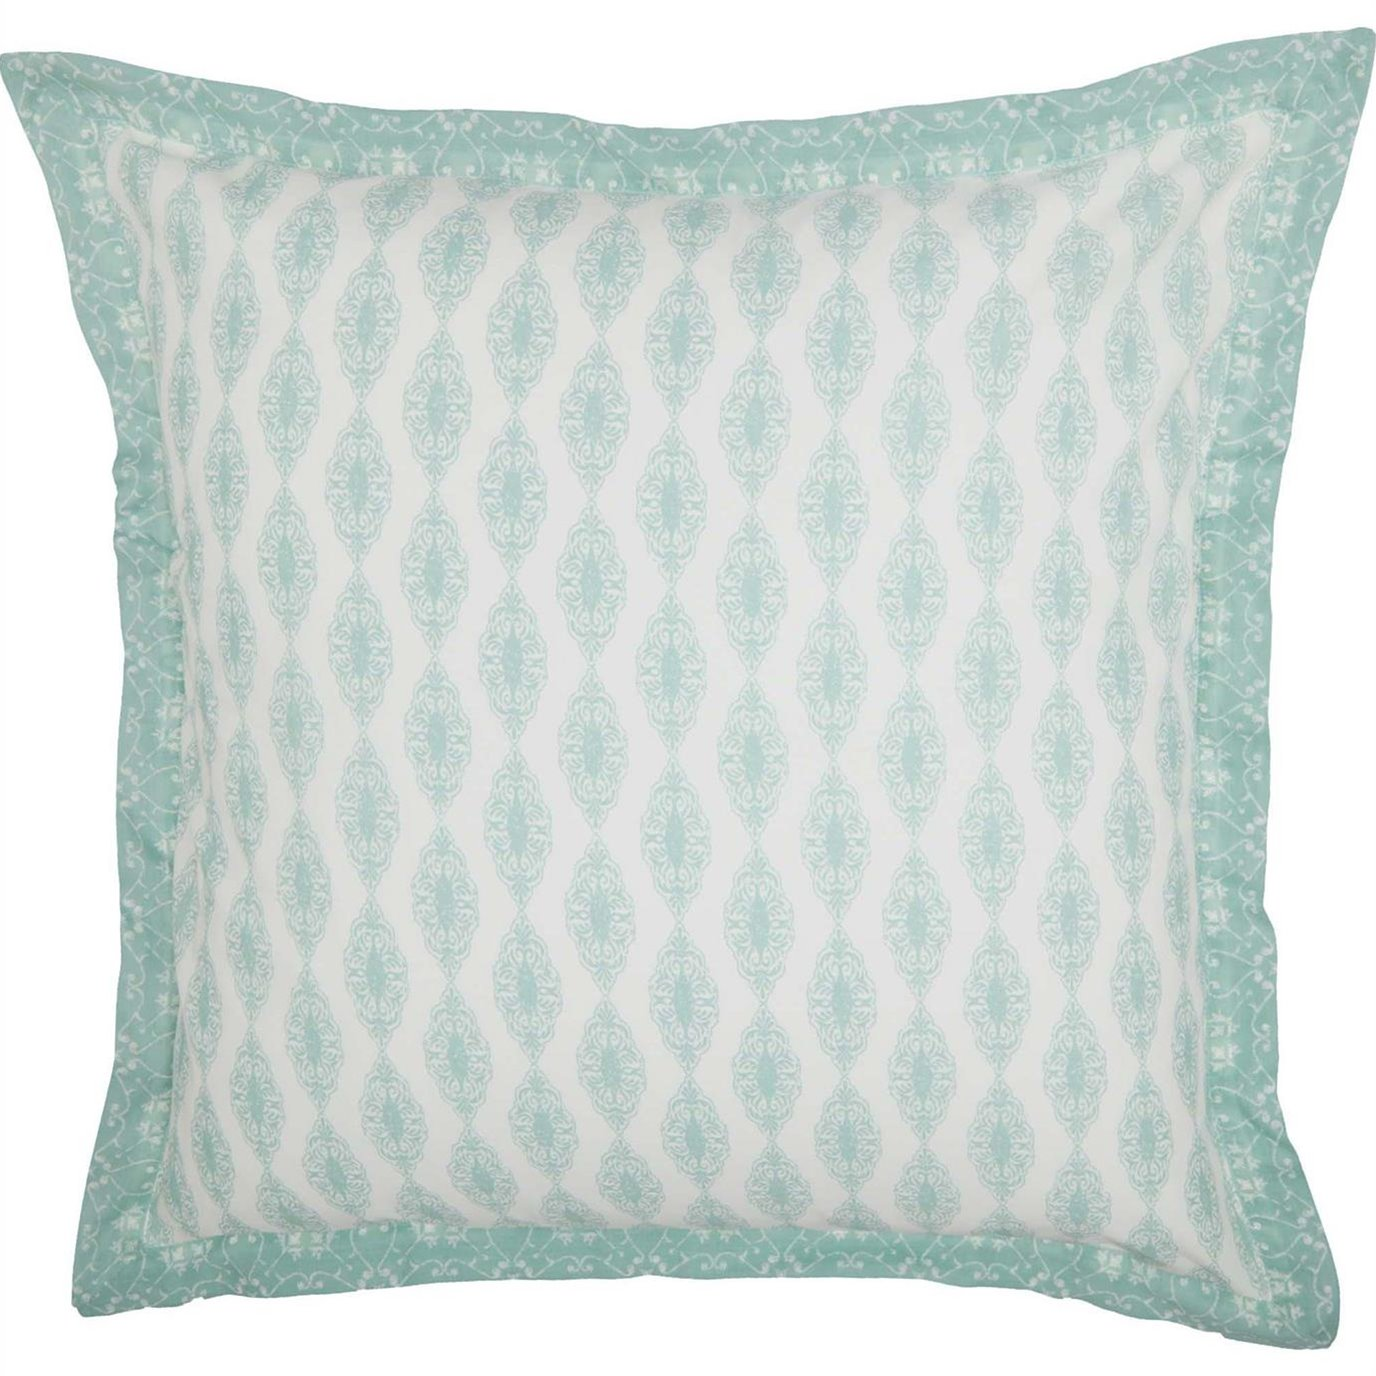 Avani Sea Glass Fabric Euro Sham 26x26